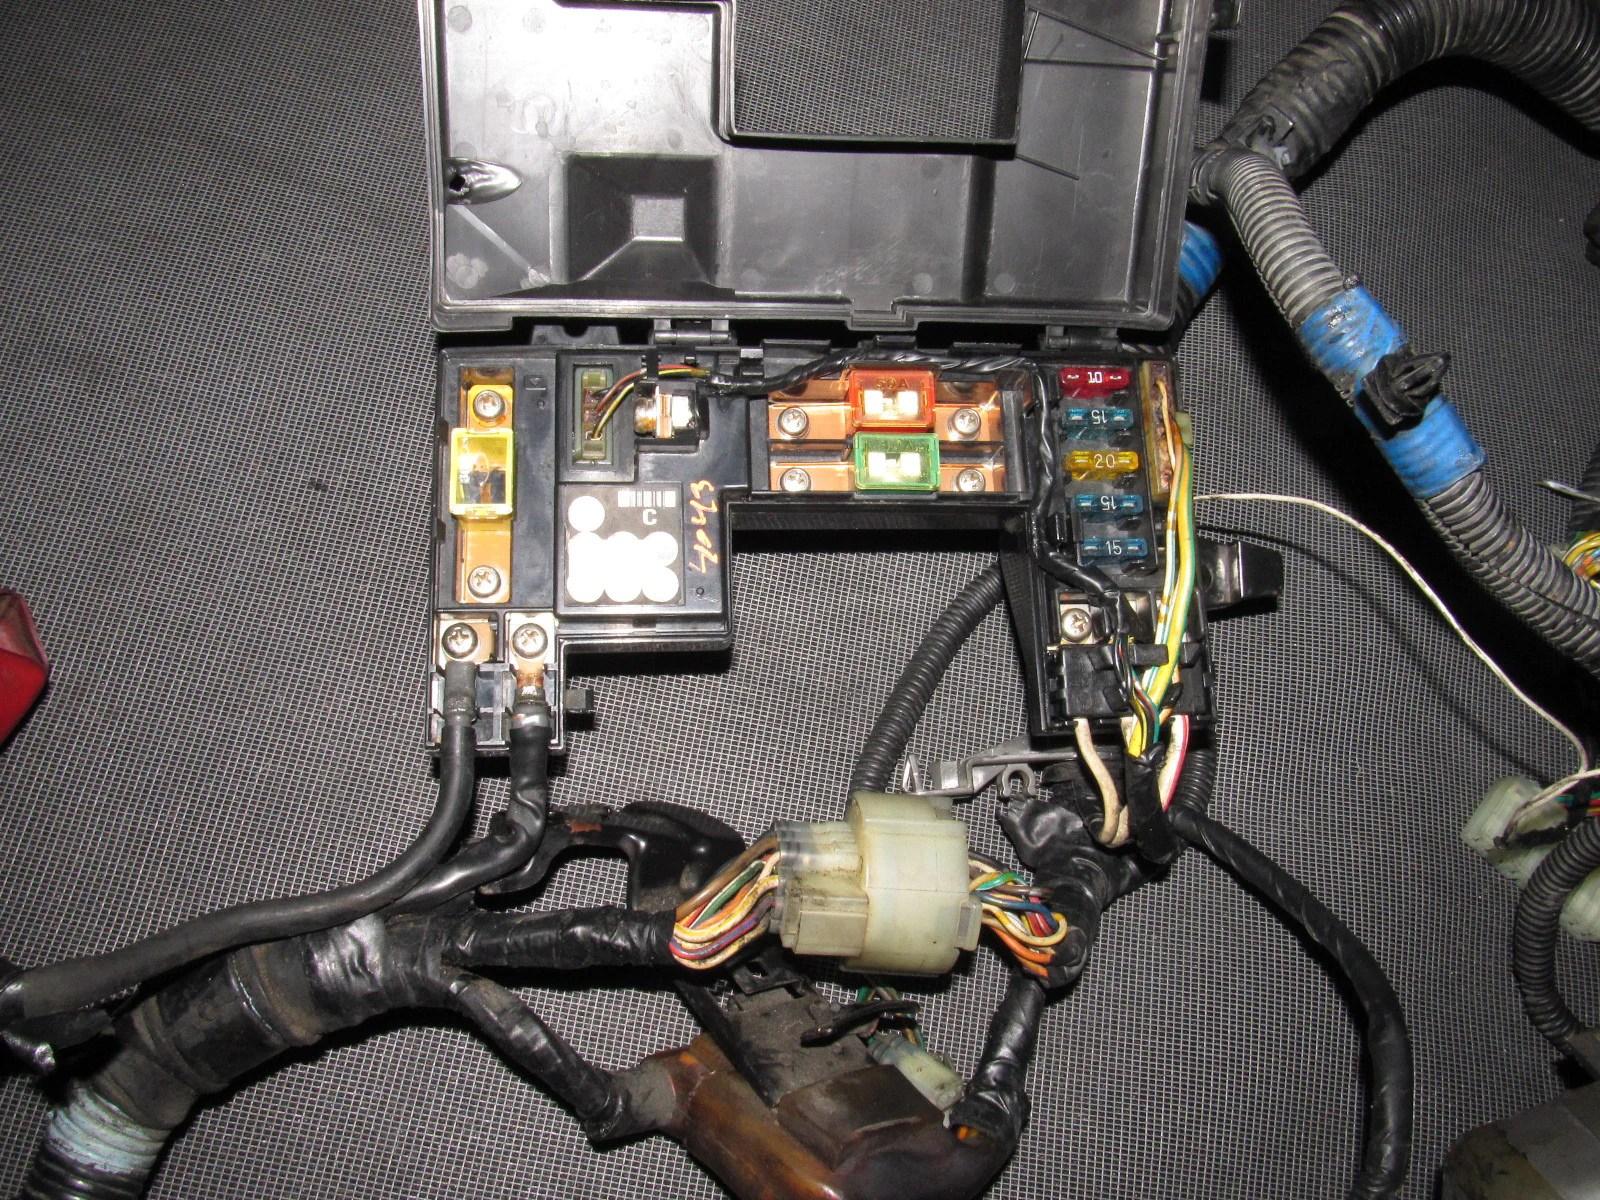 medium resolution of  honda crx wiring harness wiring diagram expert on 1970 chevelle ss wiring harness diagram 91 crx si